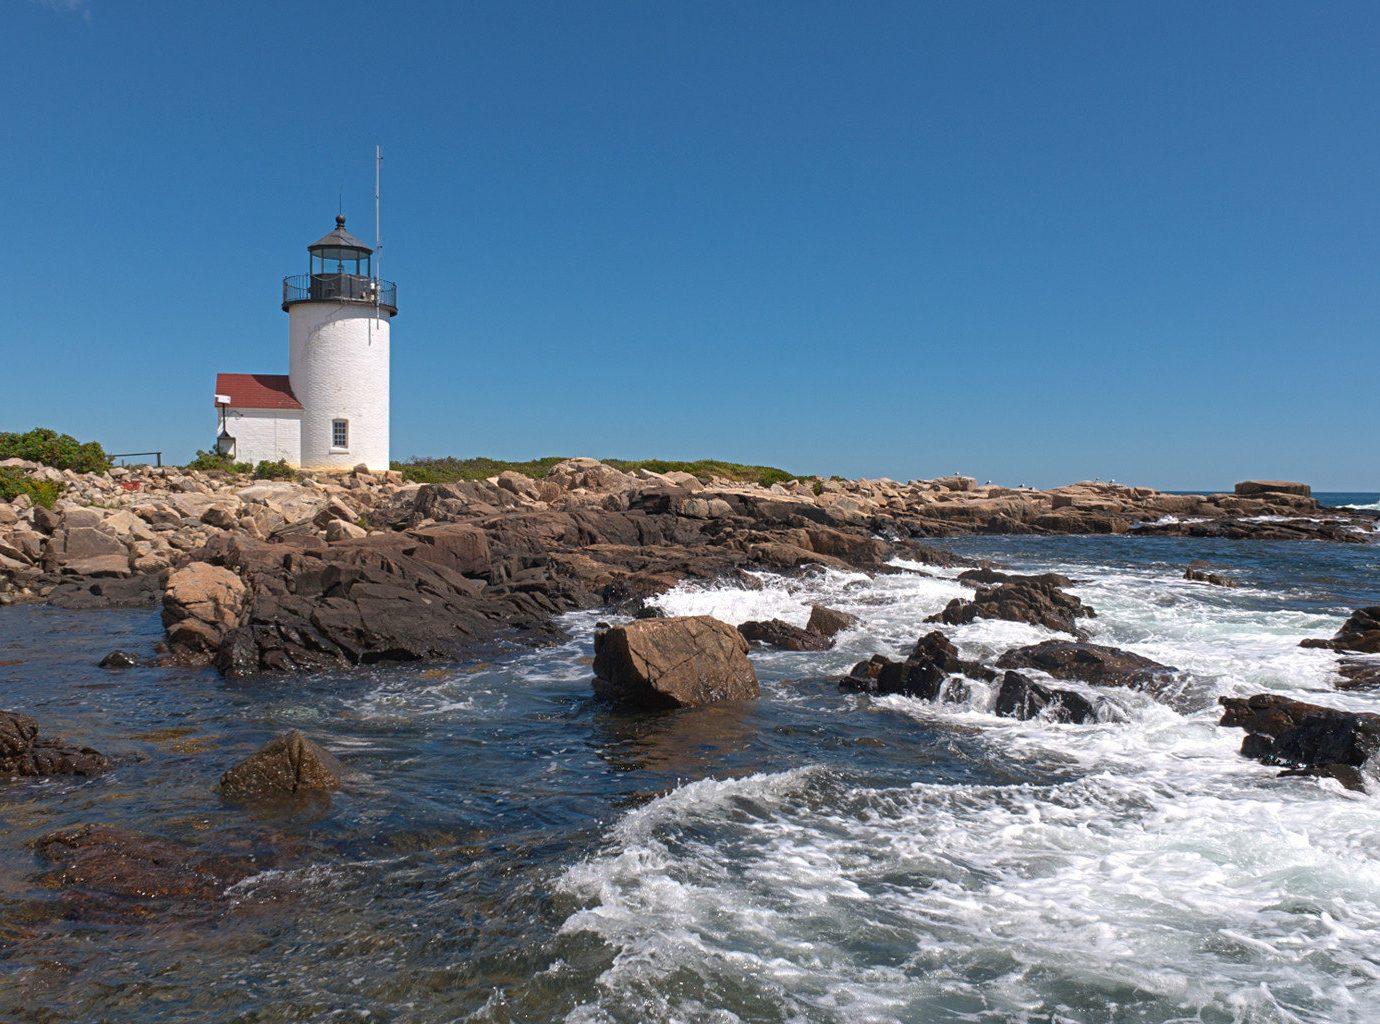 Lighthouse overlooking the ocean